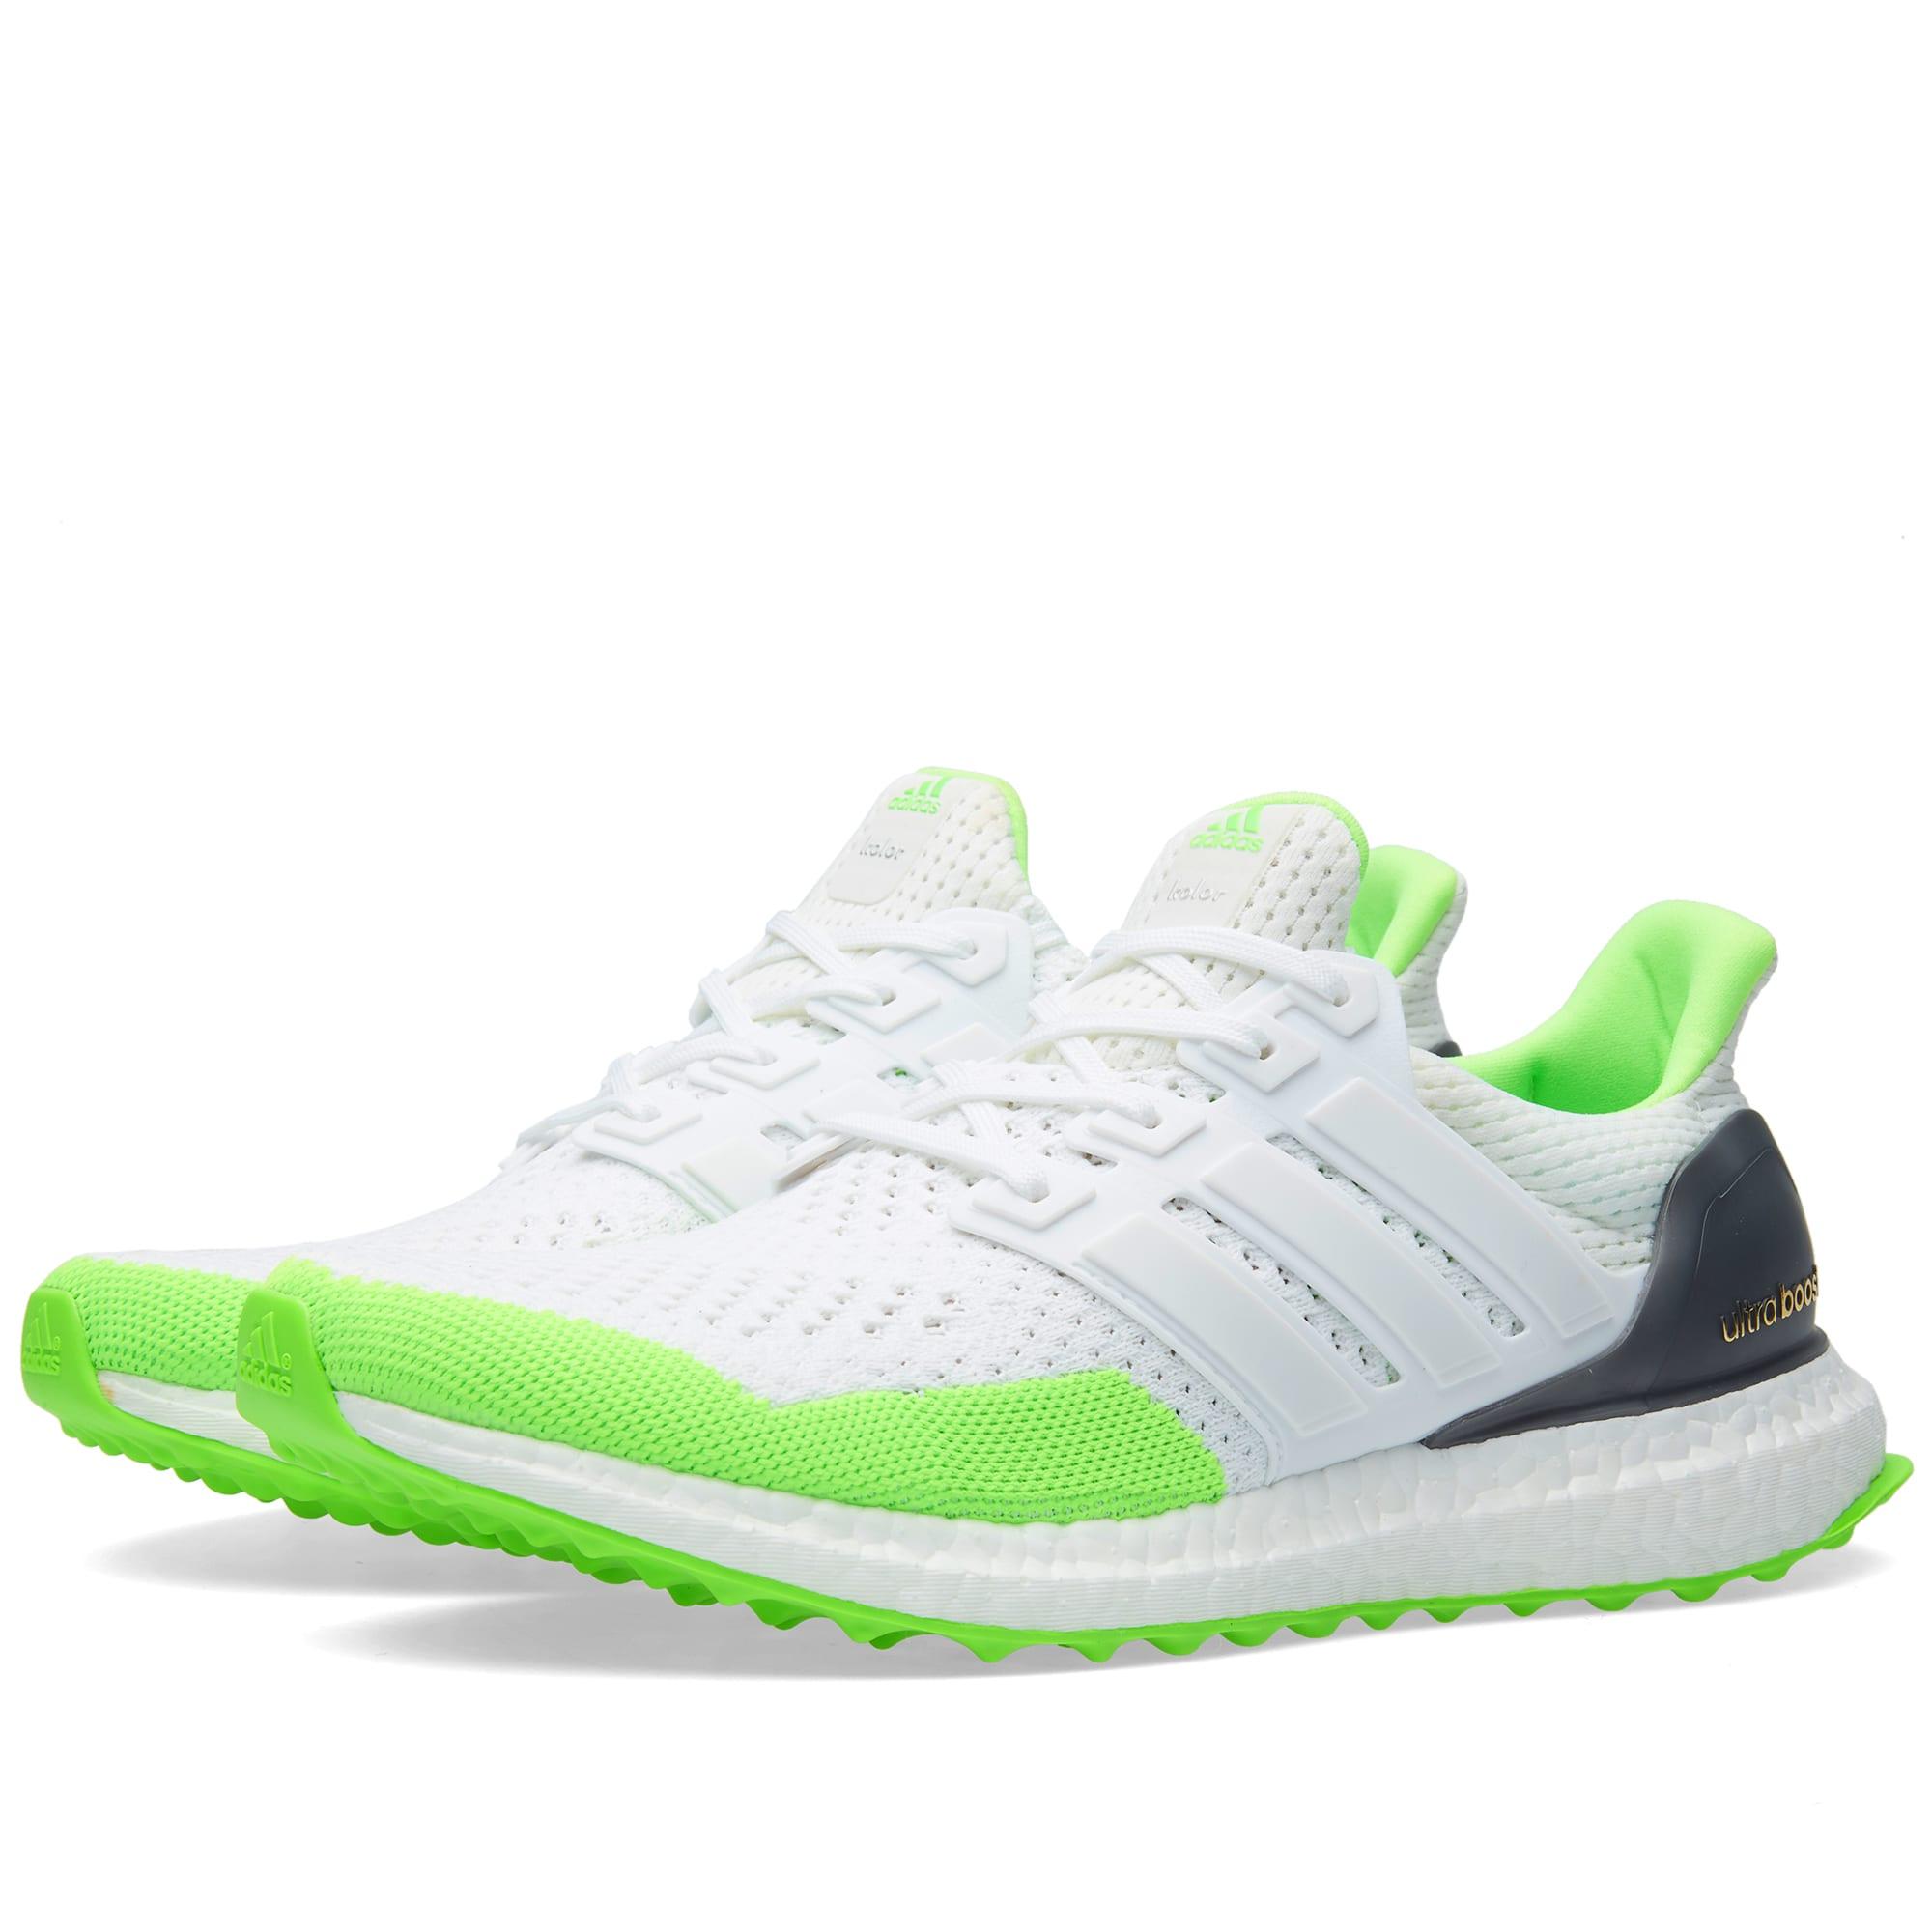 Adidas x Kolor Ultra Boost